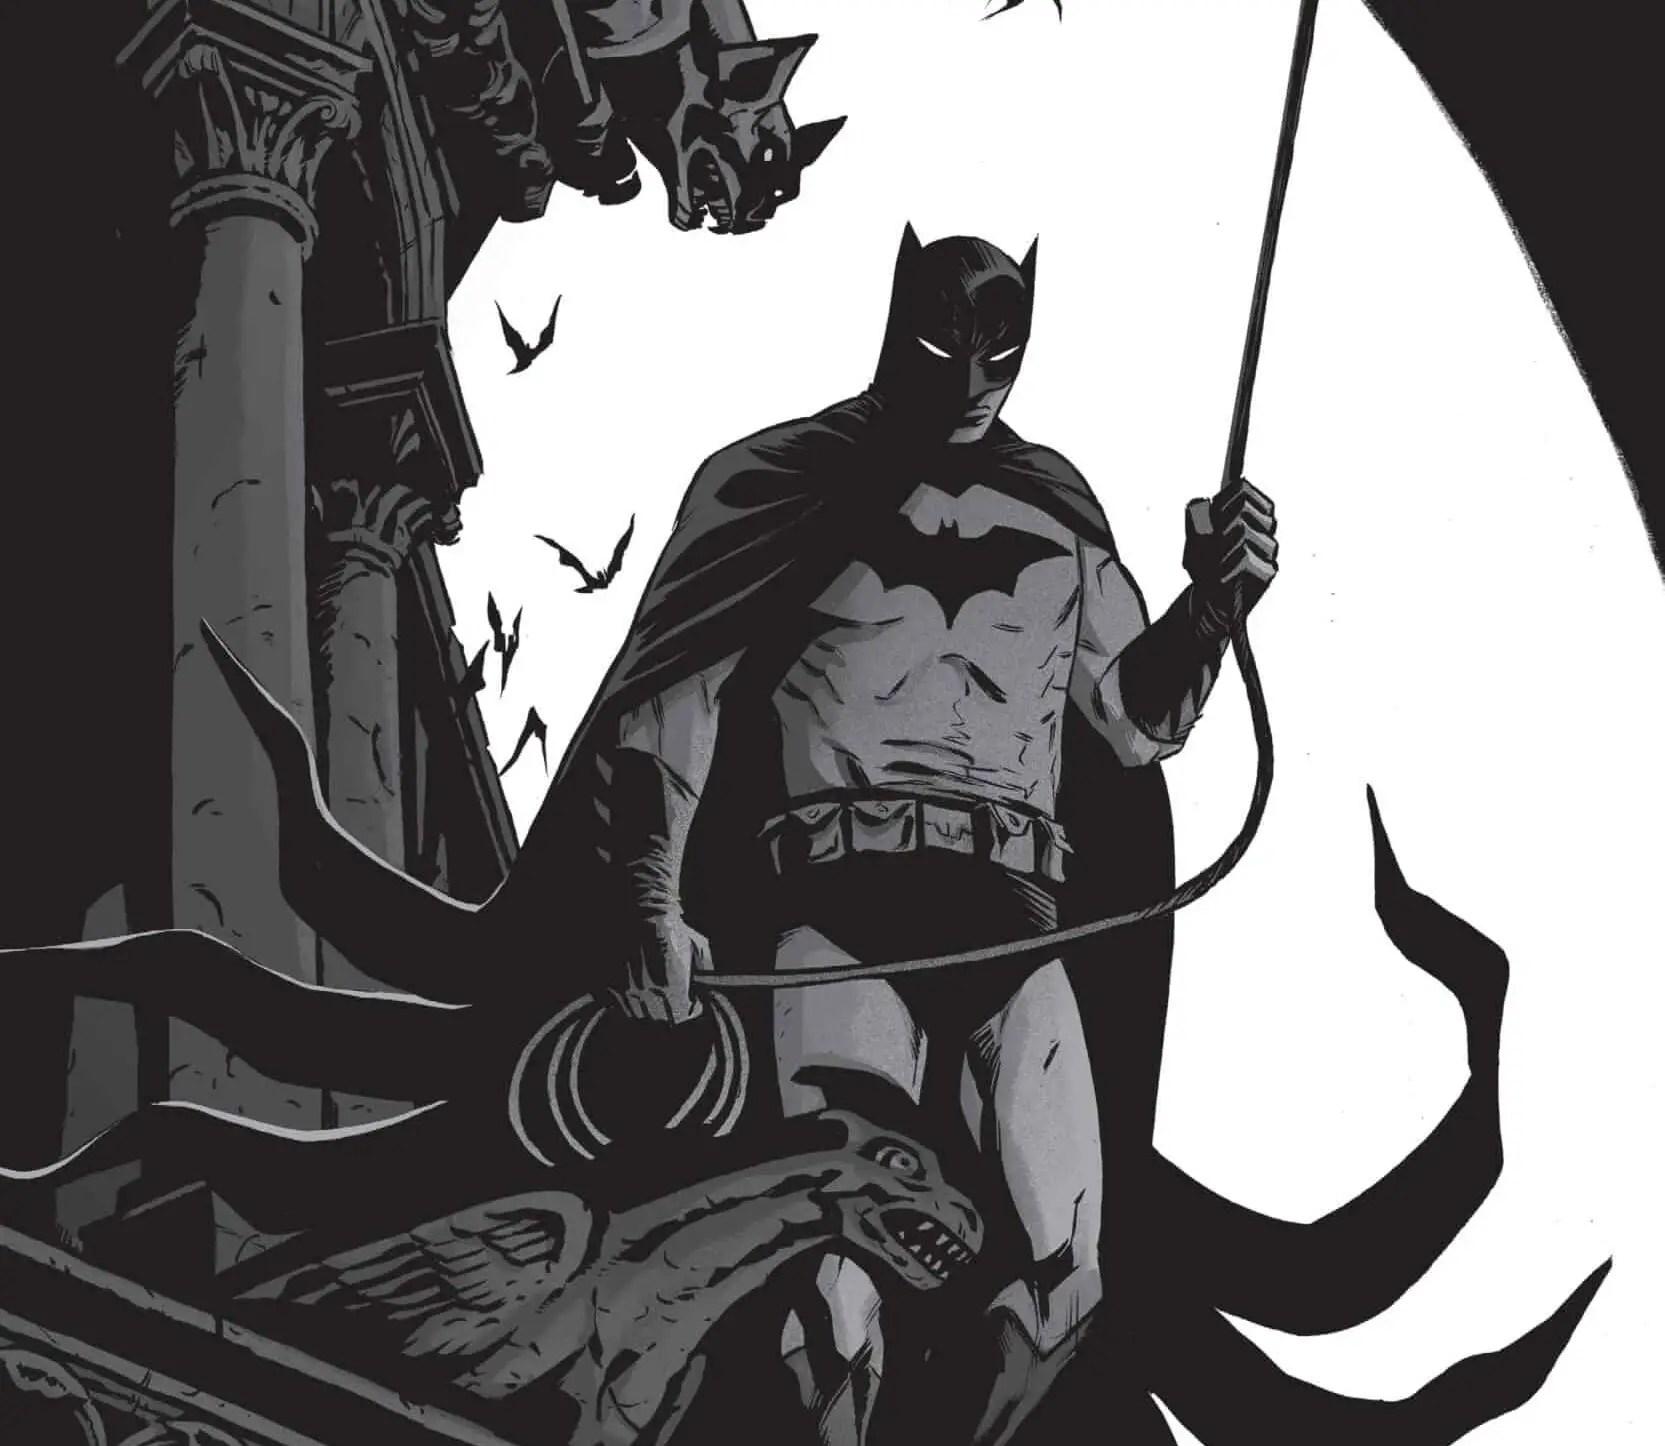 Batman: Black & White #4 cover by Becky Cloonan